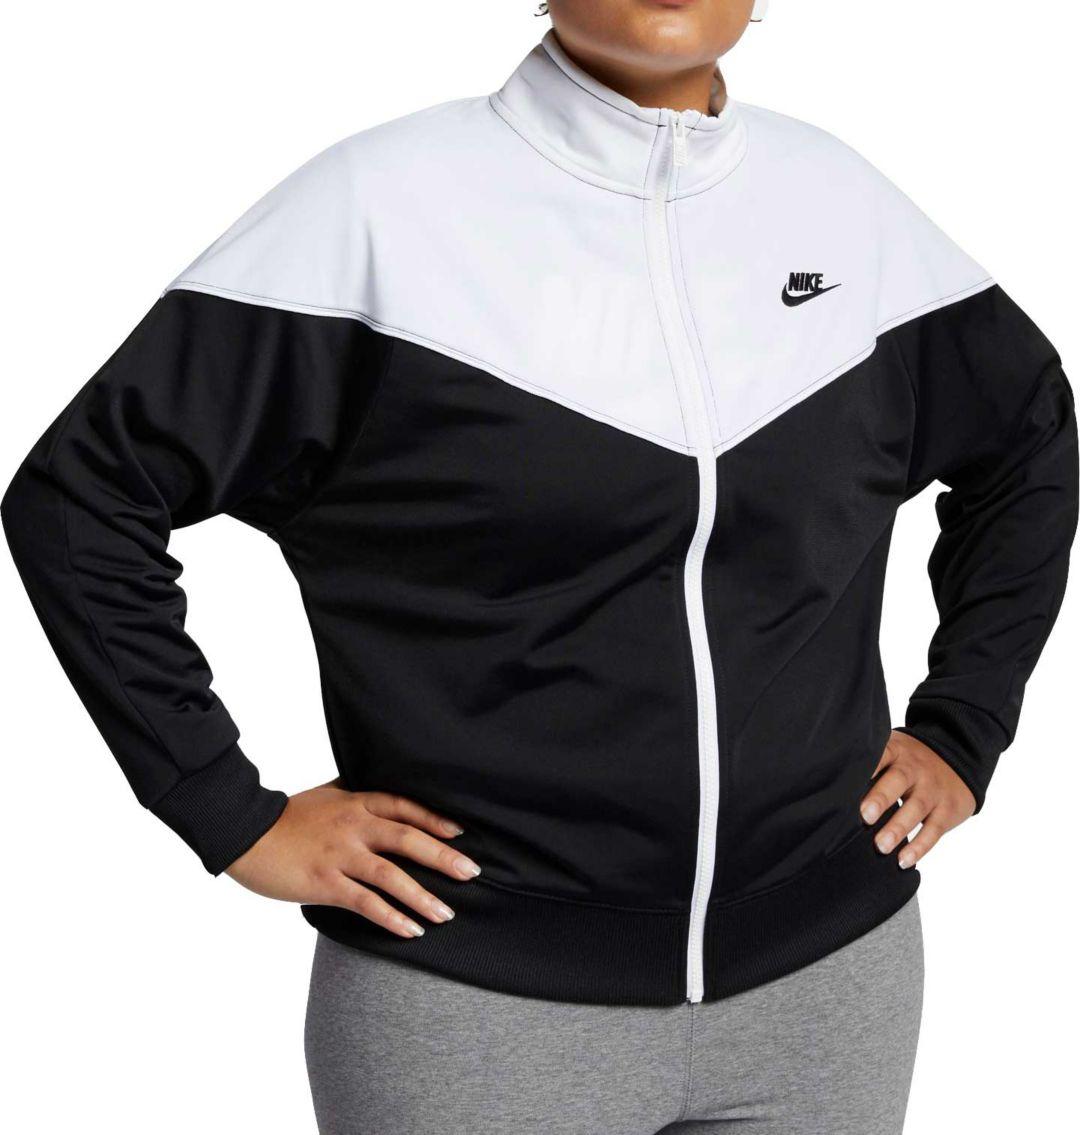 67f1f4e0c Nike Women's Plus Size Sportswear Track Jacket. noImageFound. Previous